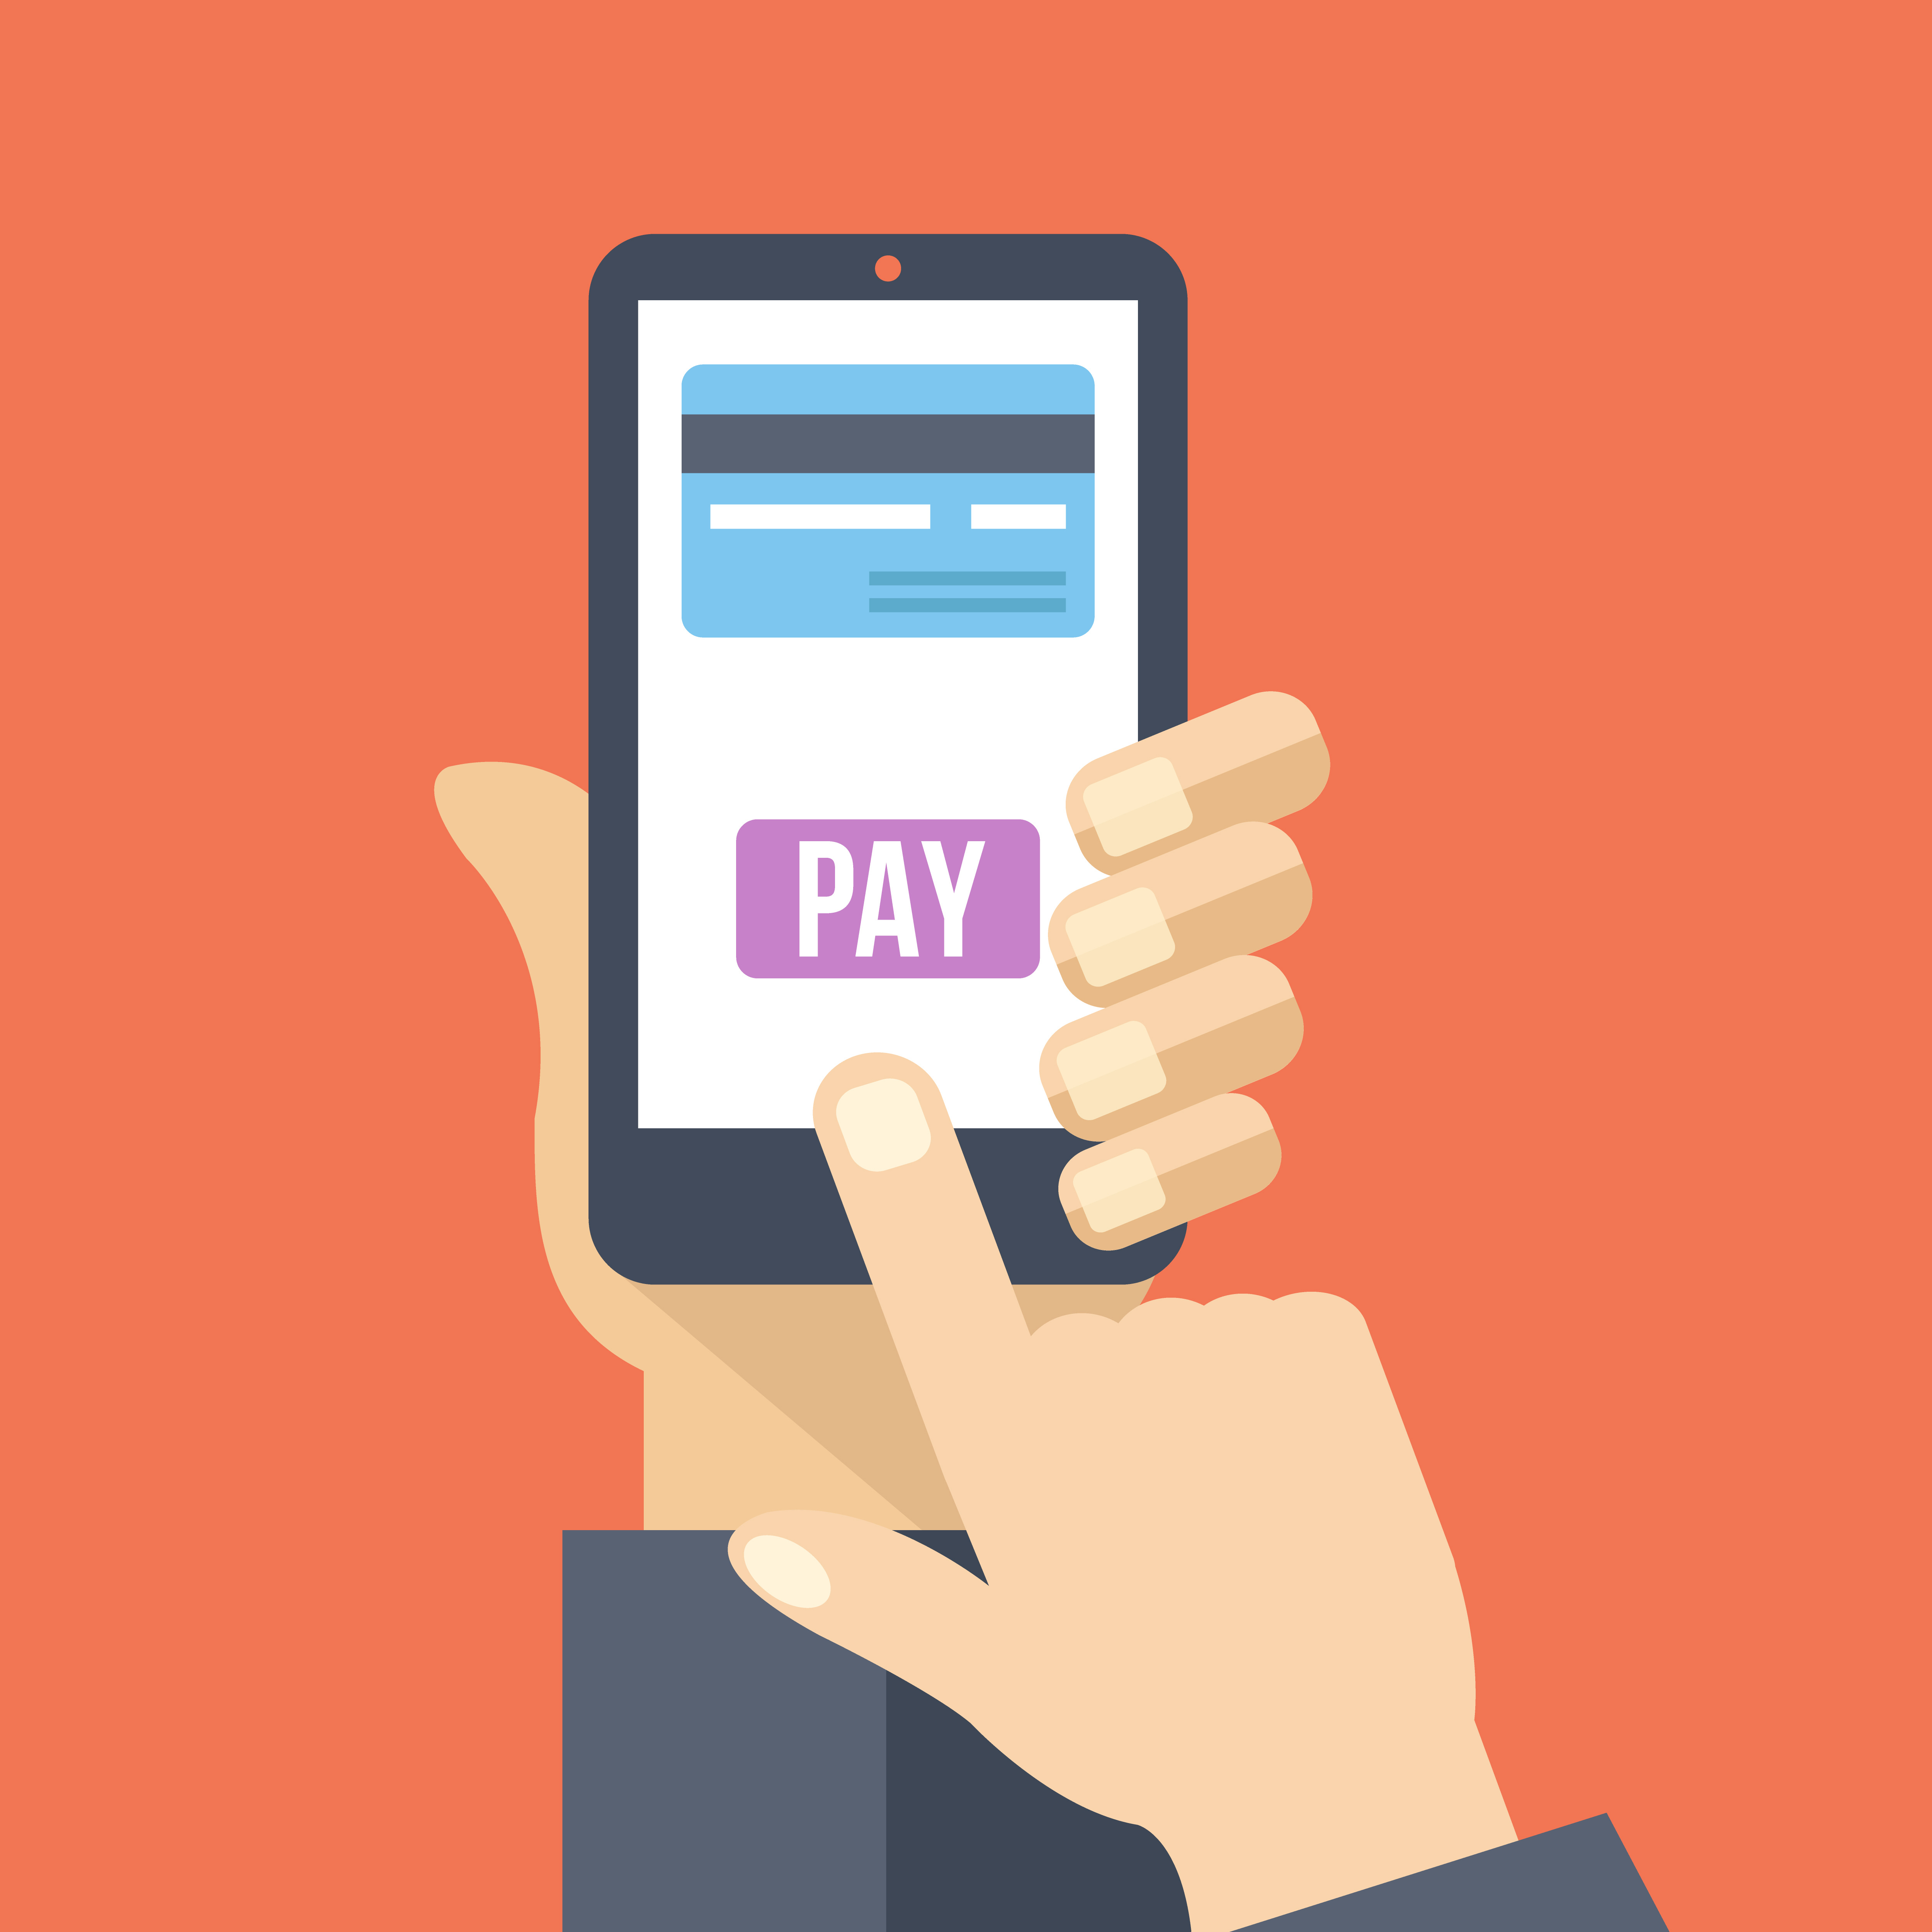 P2P Instant Payment Options